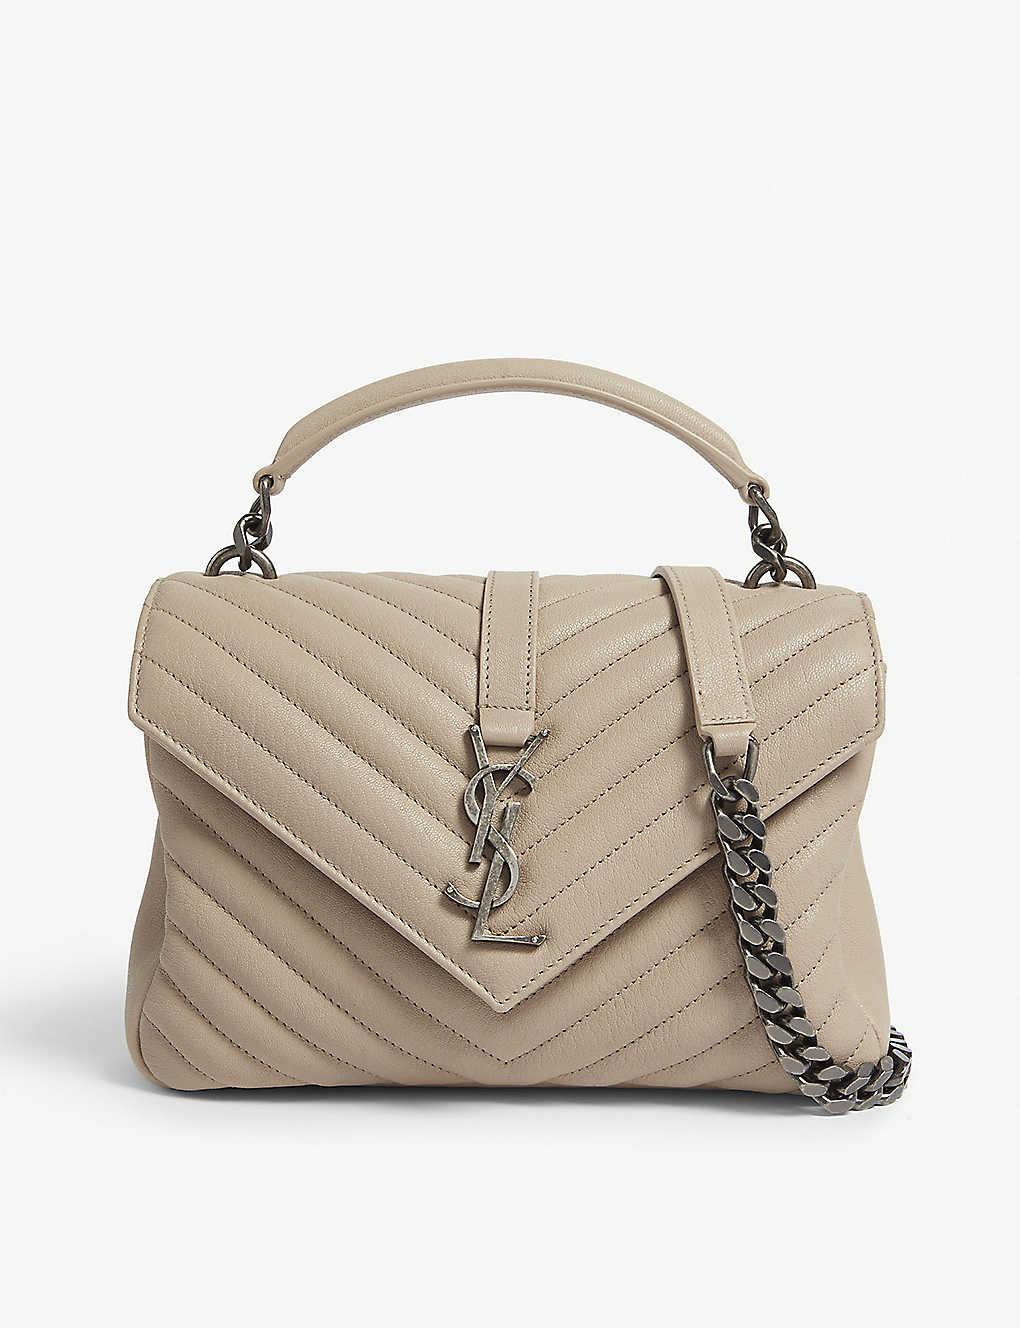 be63038e3854 College monogram quilted leather shoulder bag - Light natural ...